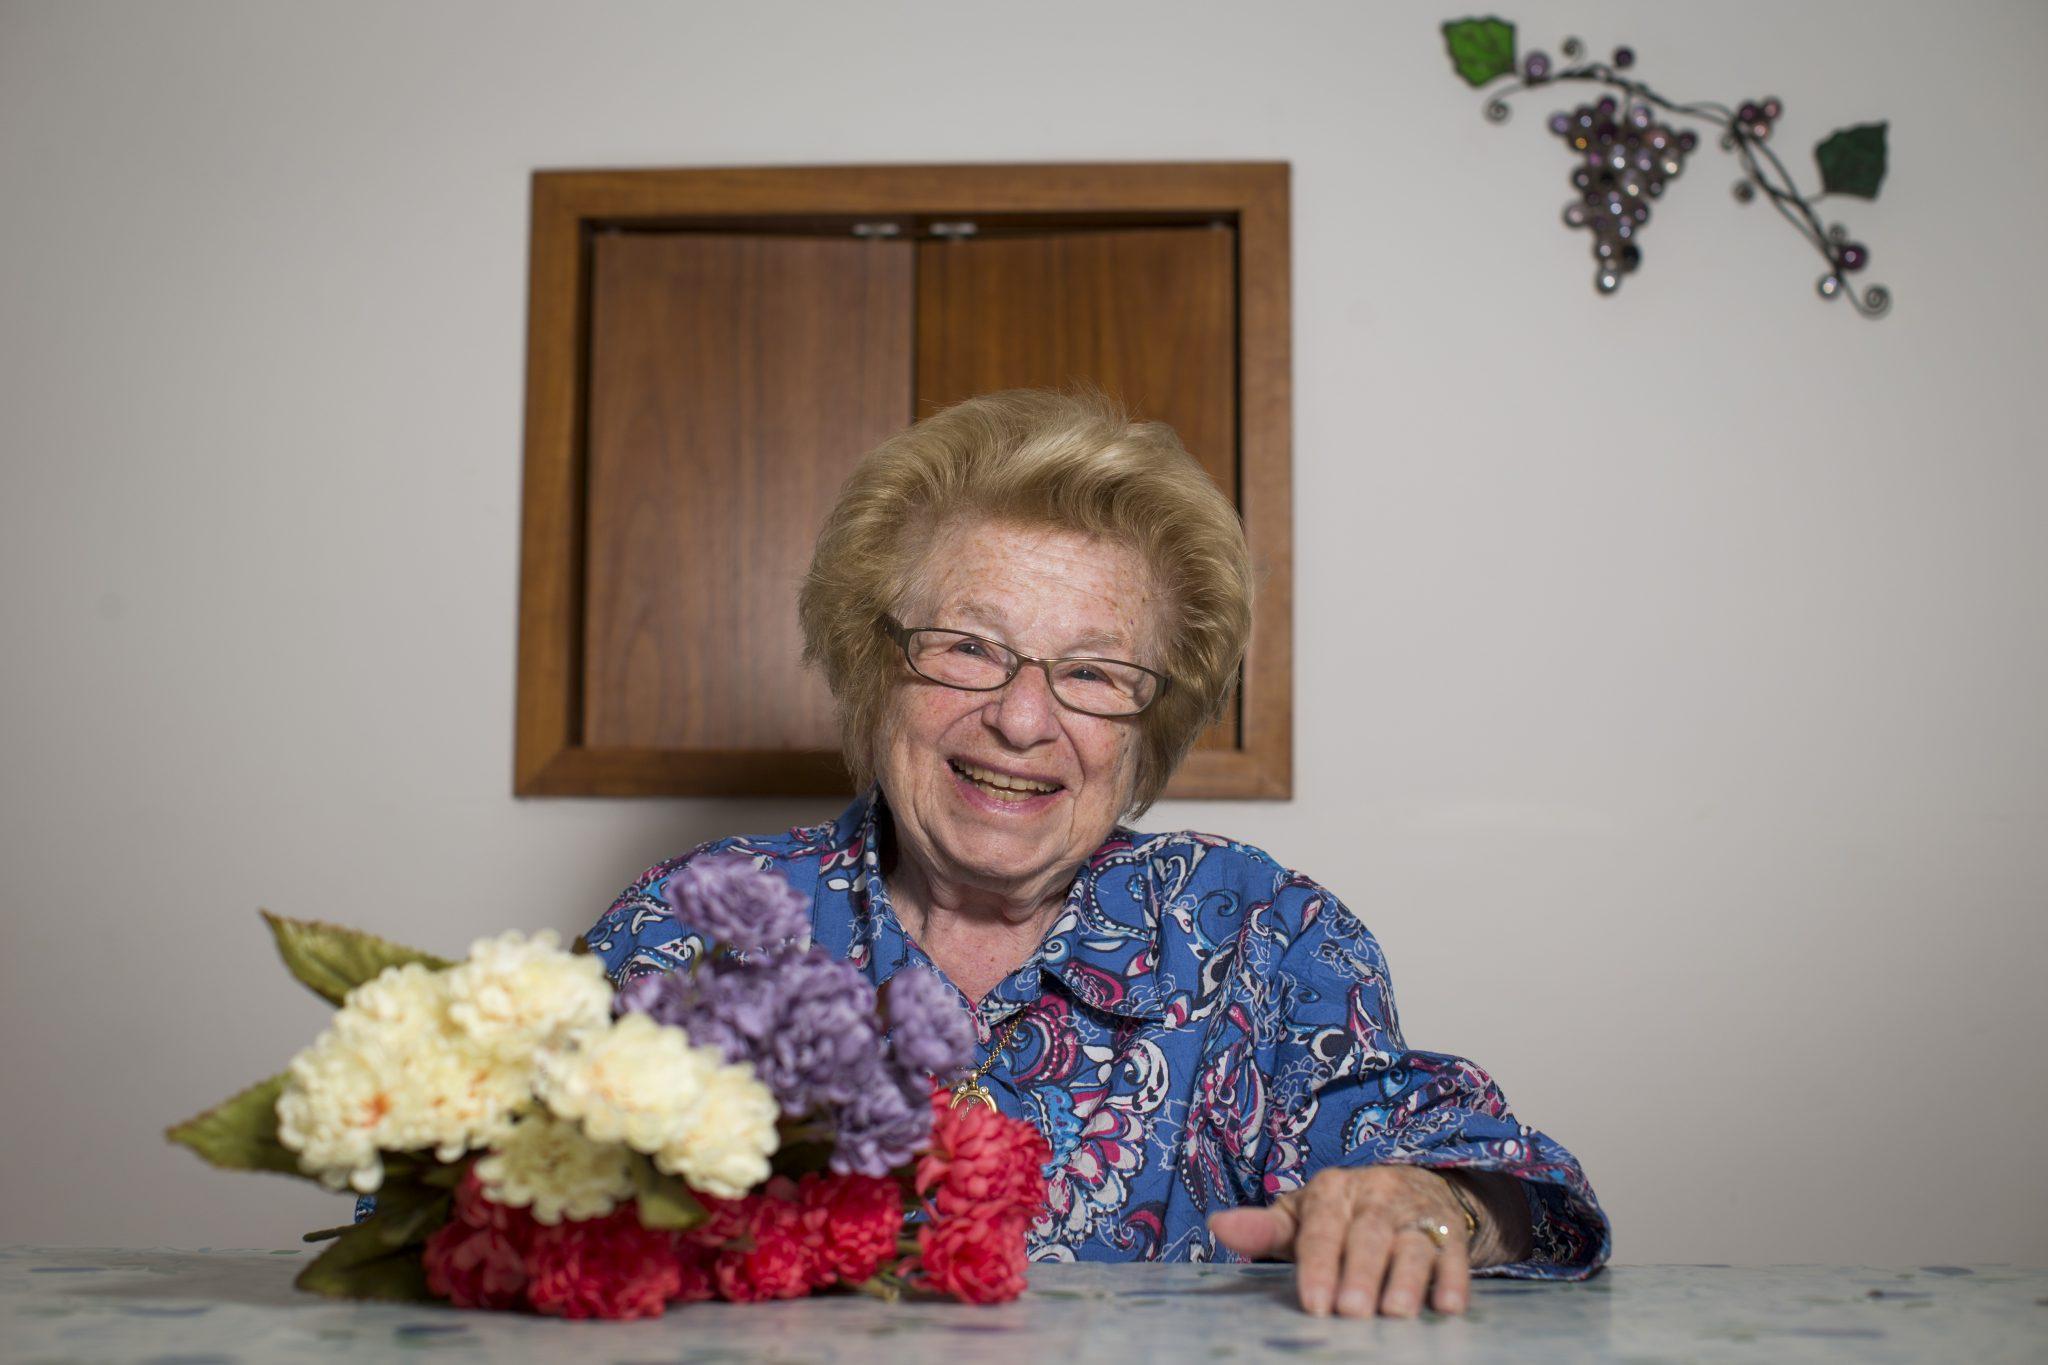 a41a08ddd67 Israel s 11 most inspiring women